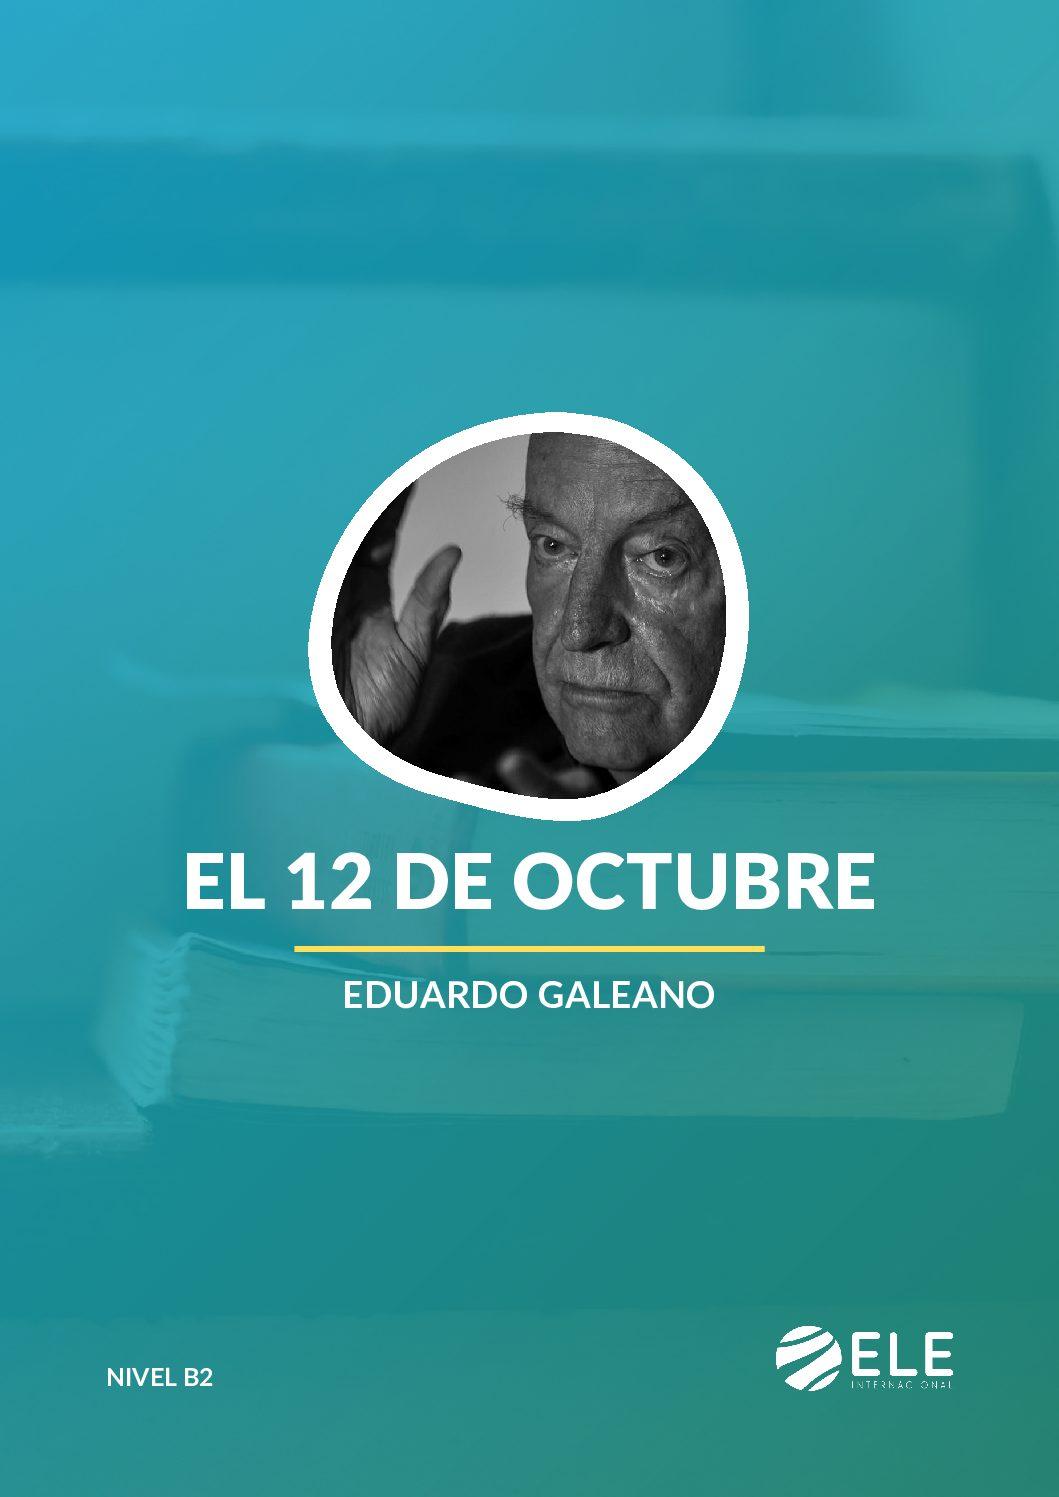 El 12 de octubre – Eduardo Galeano